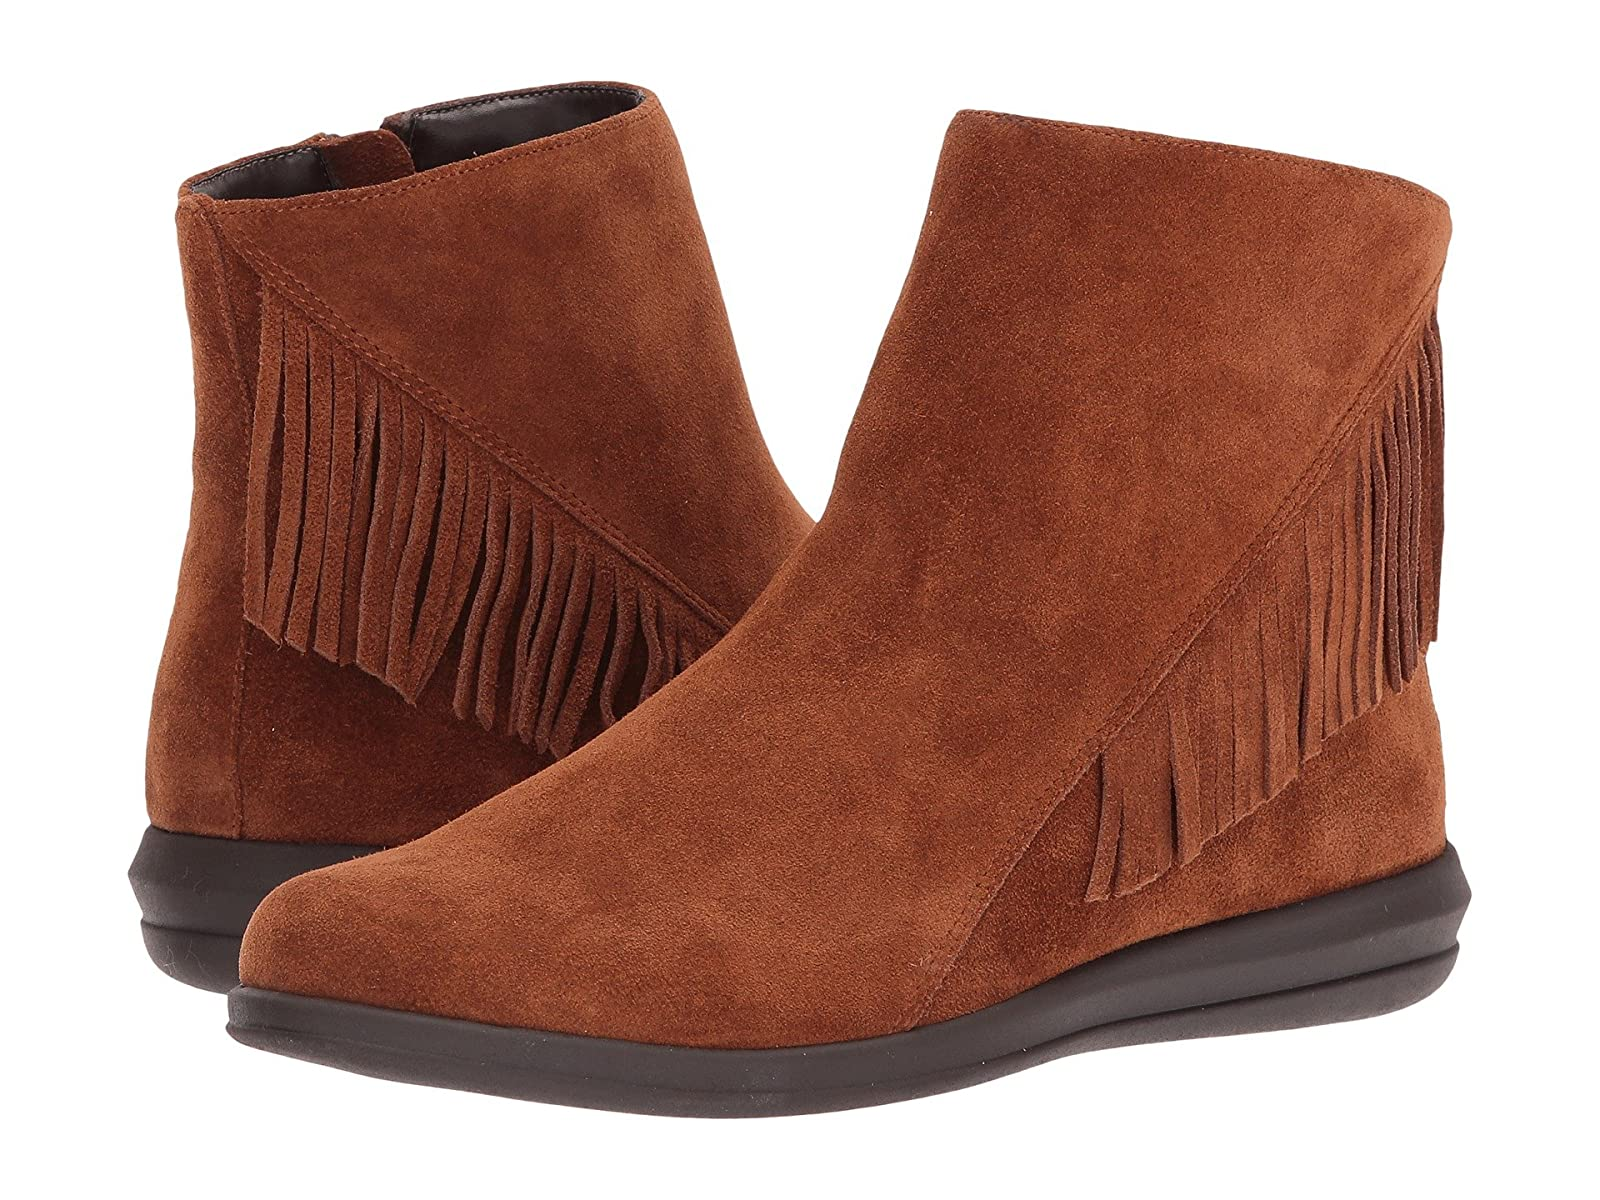 David Tate ZestCheap and distinctive eye-catching shoes